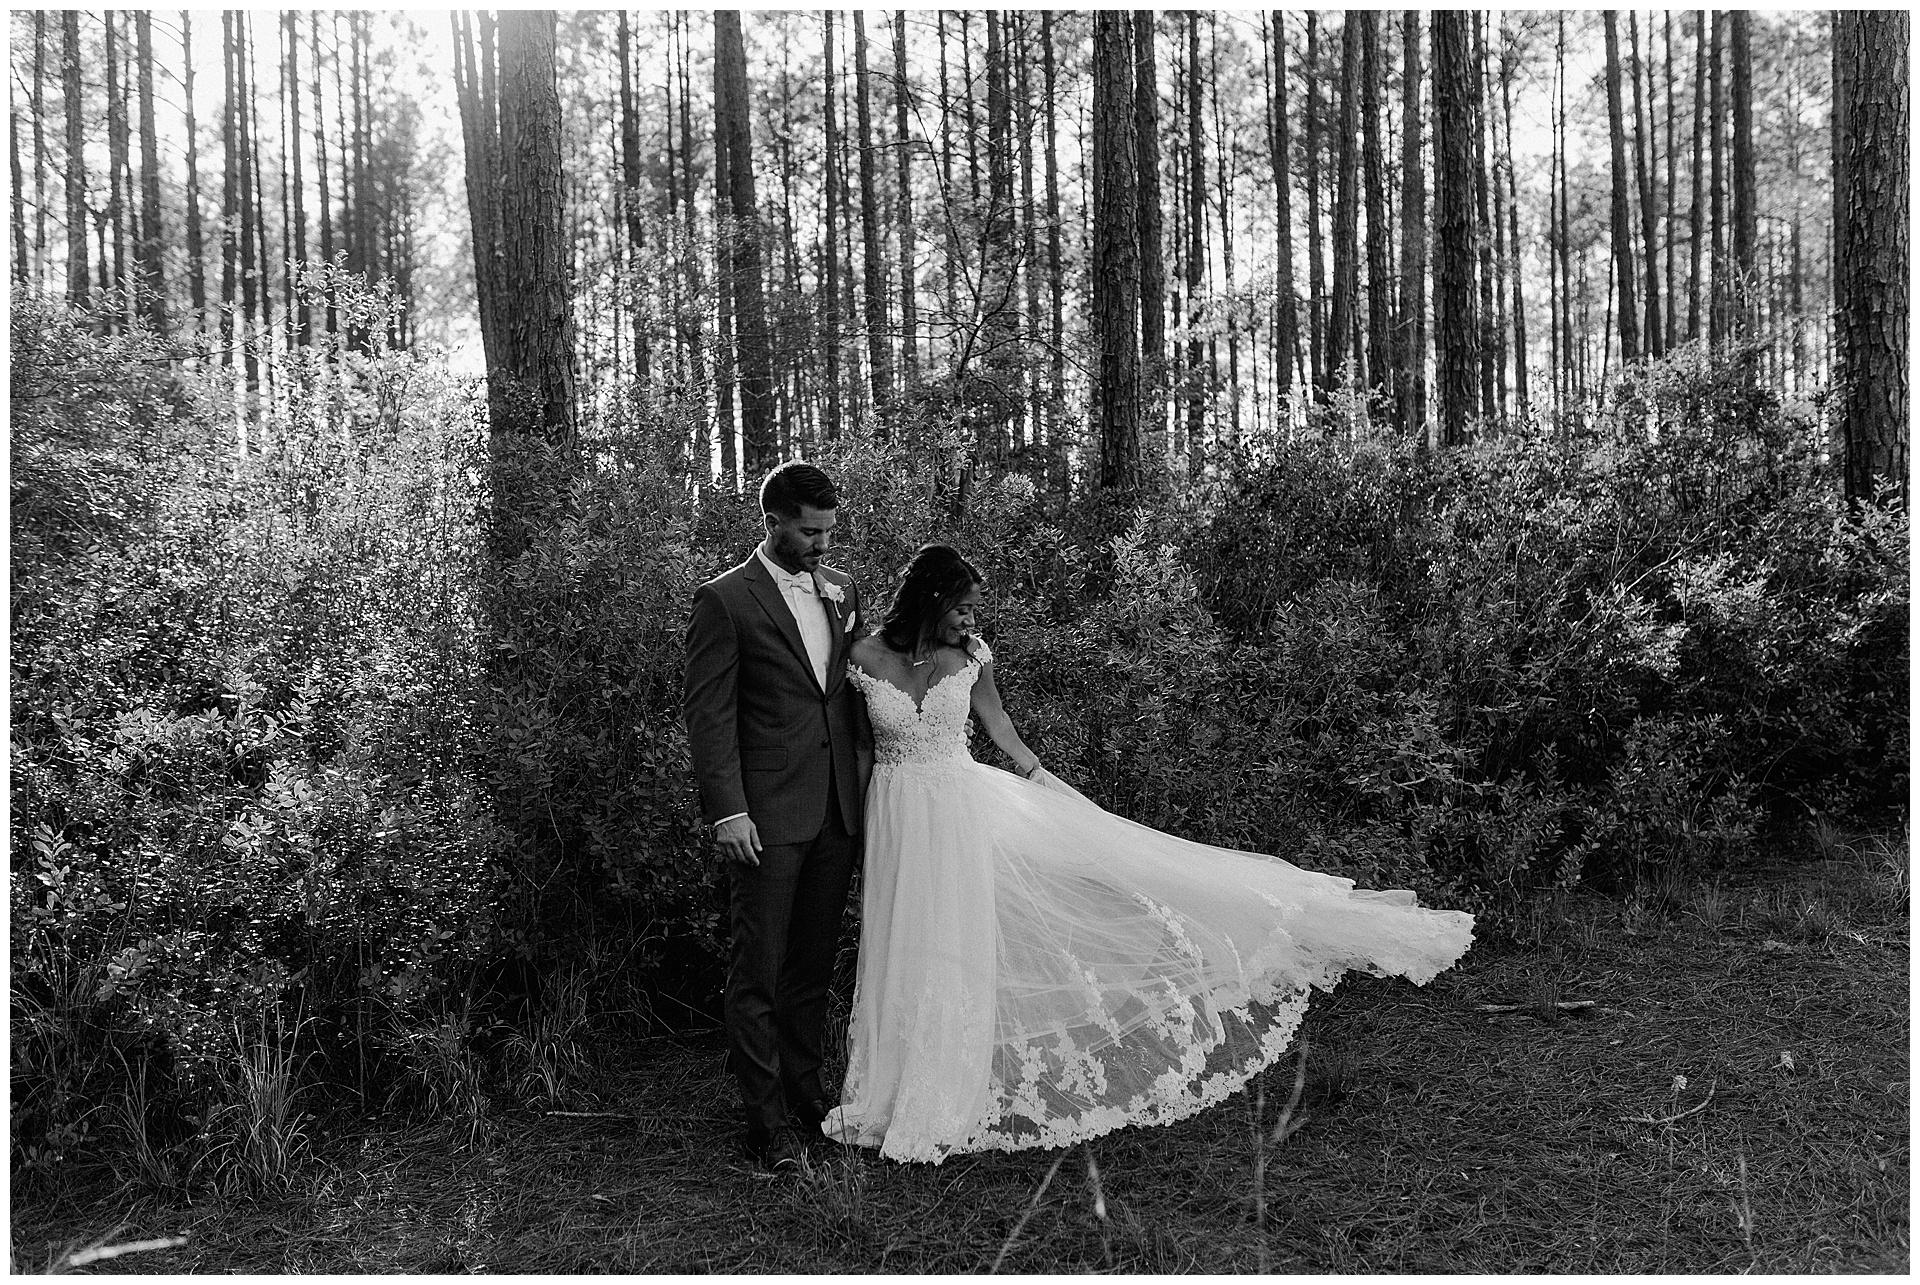 st augustine wedding photographer_mia dimare photography36.jpg